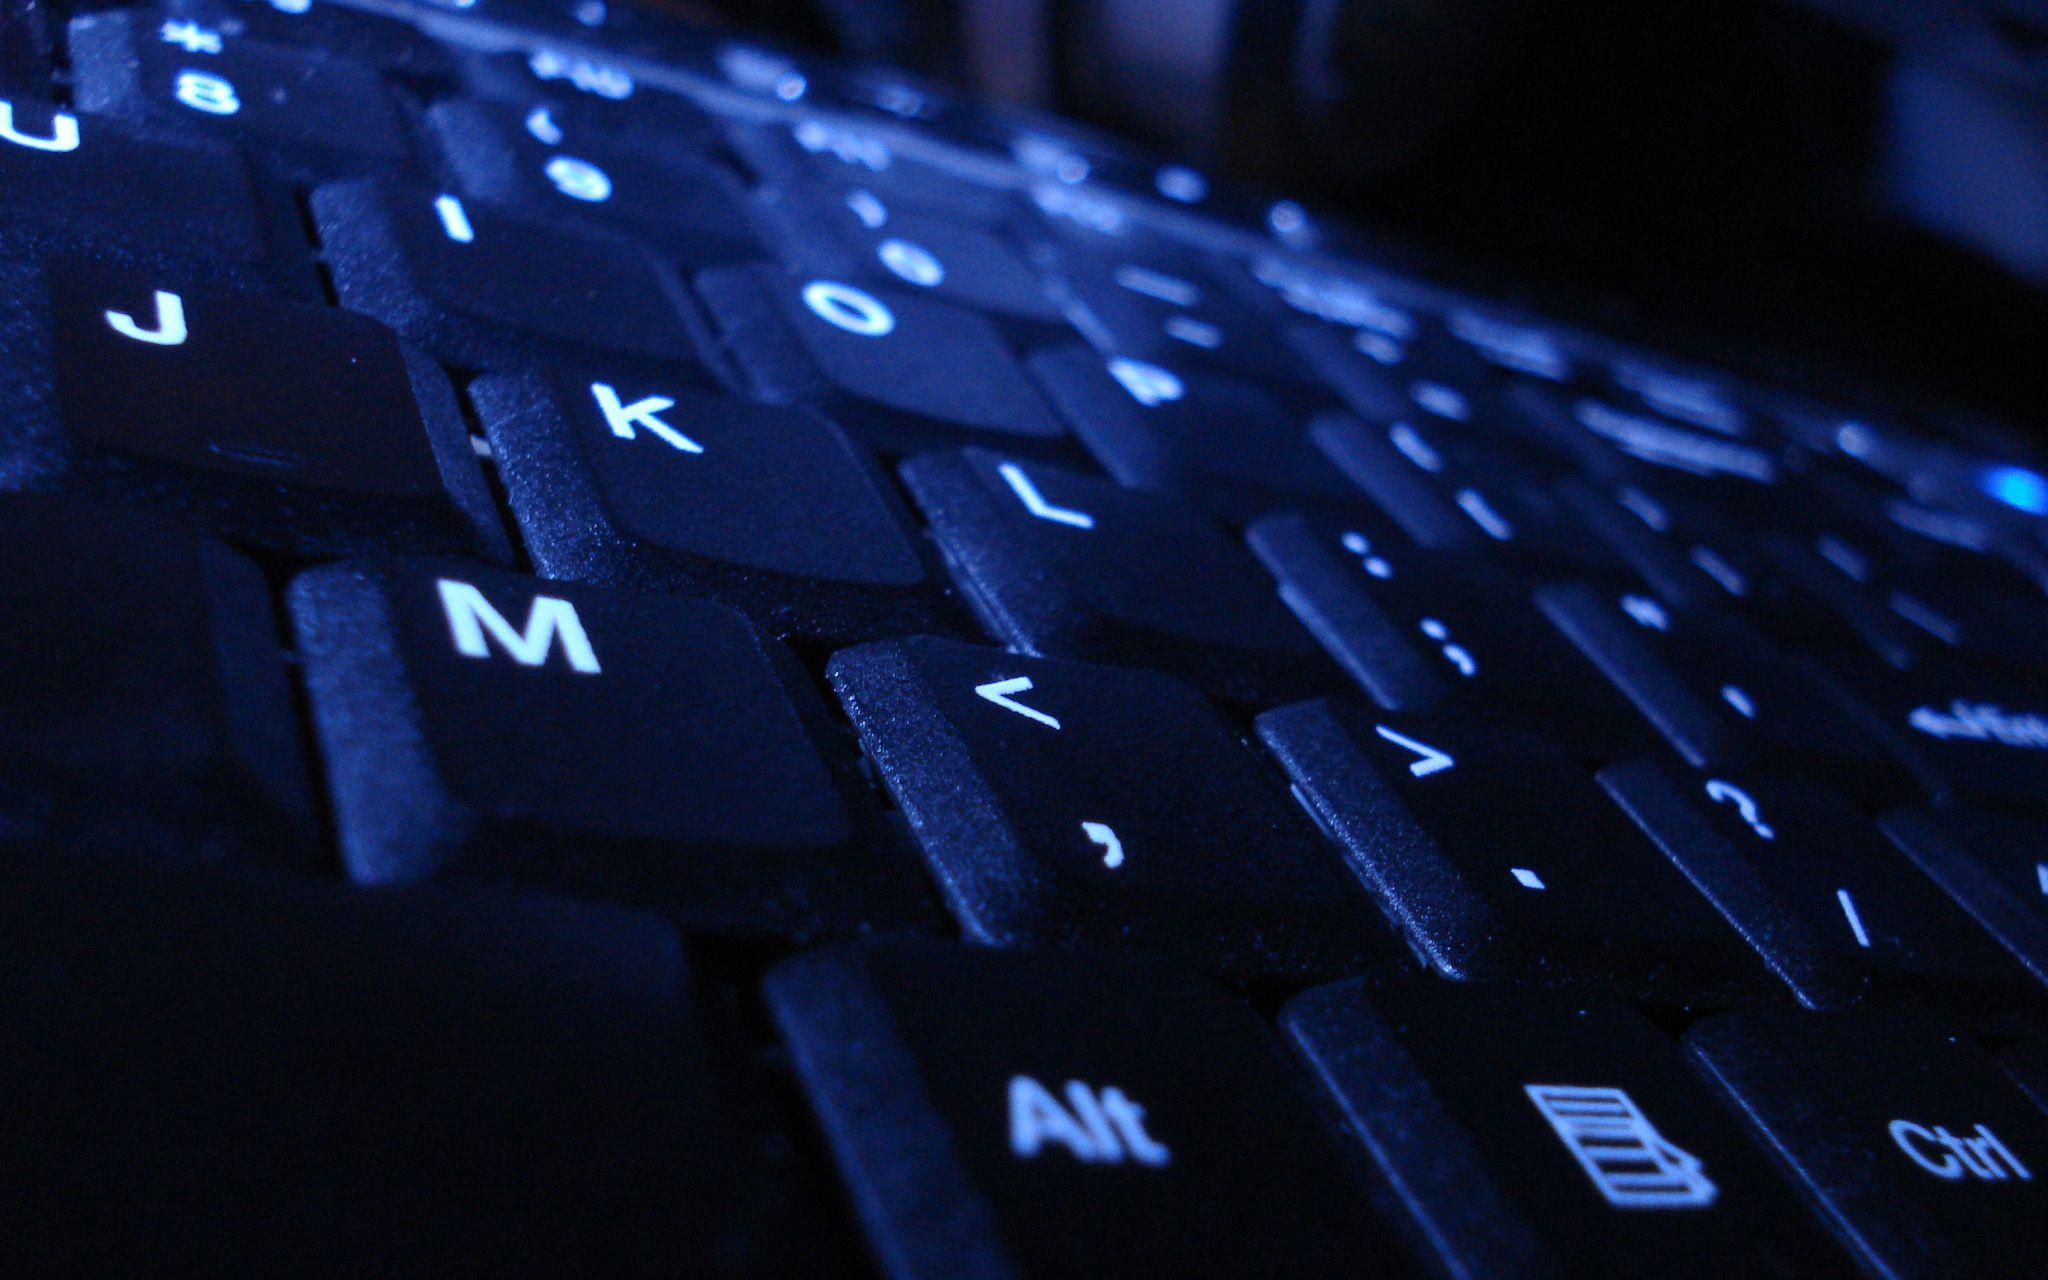 photos of keyboard